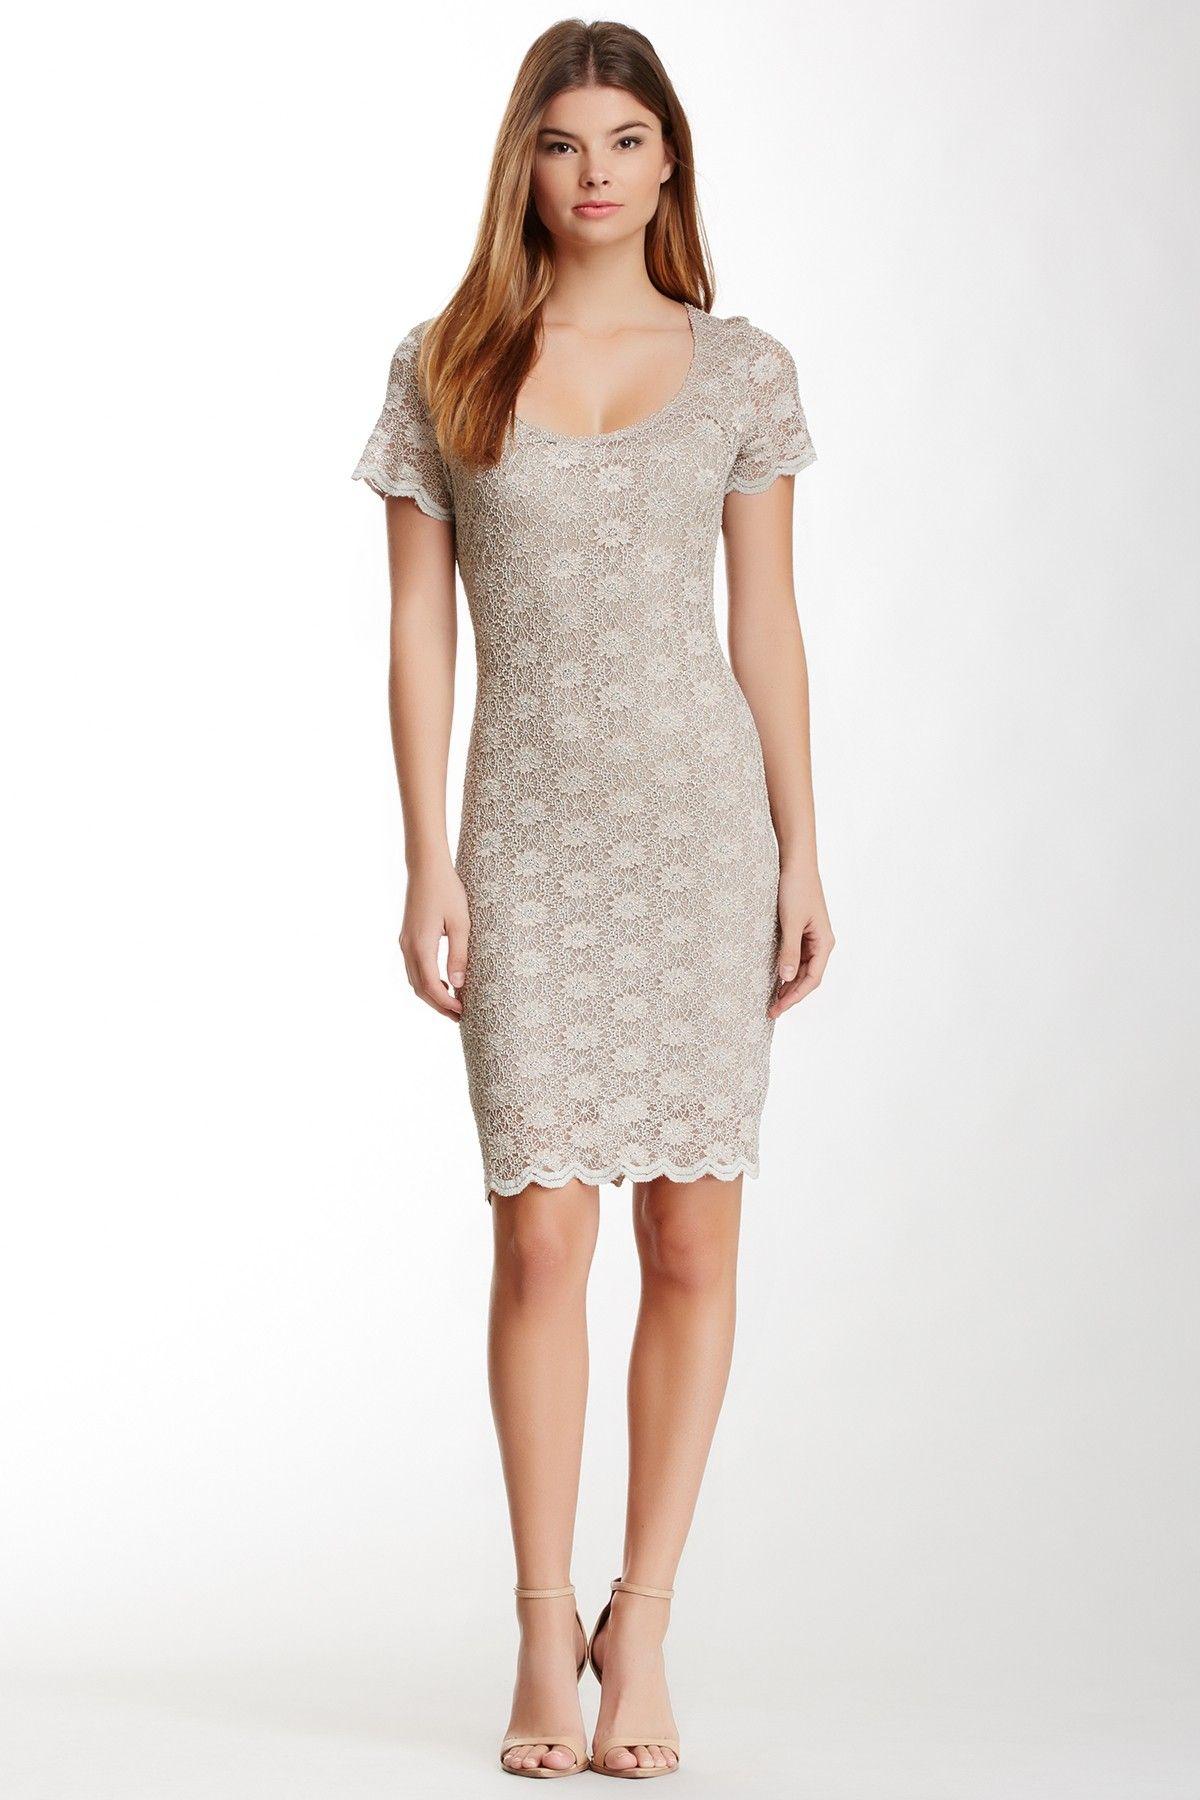 Tiana B Short Sleeve Lace Dress Fashion Beauty To Every Day